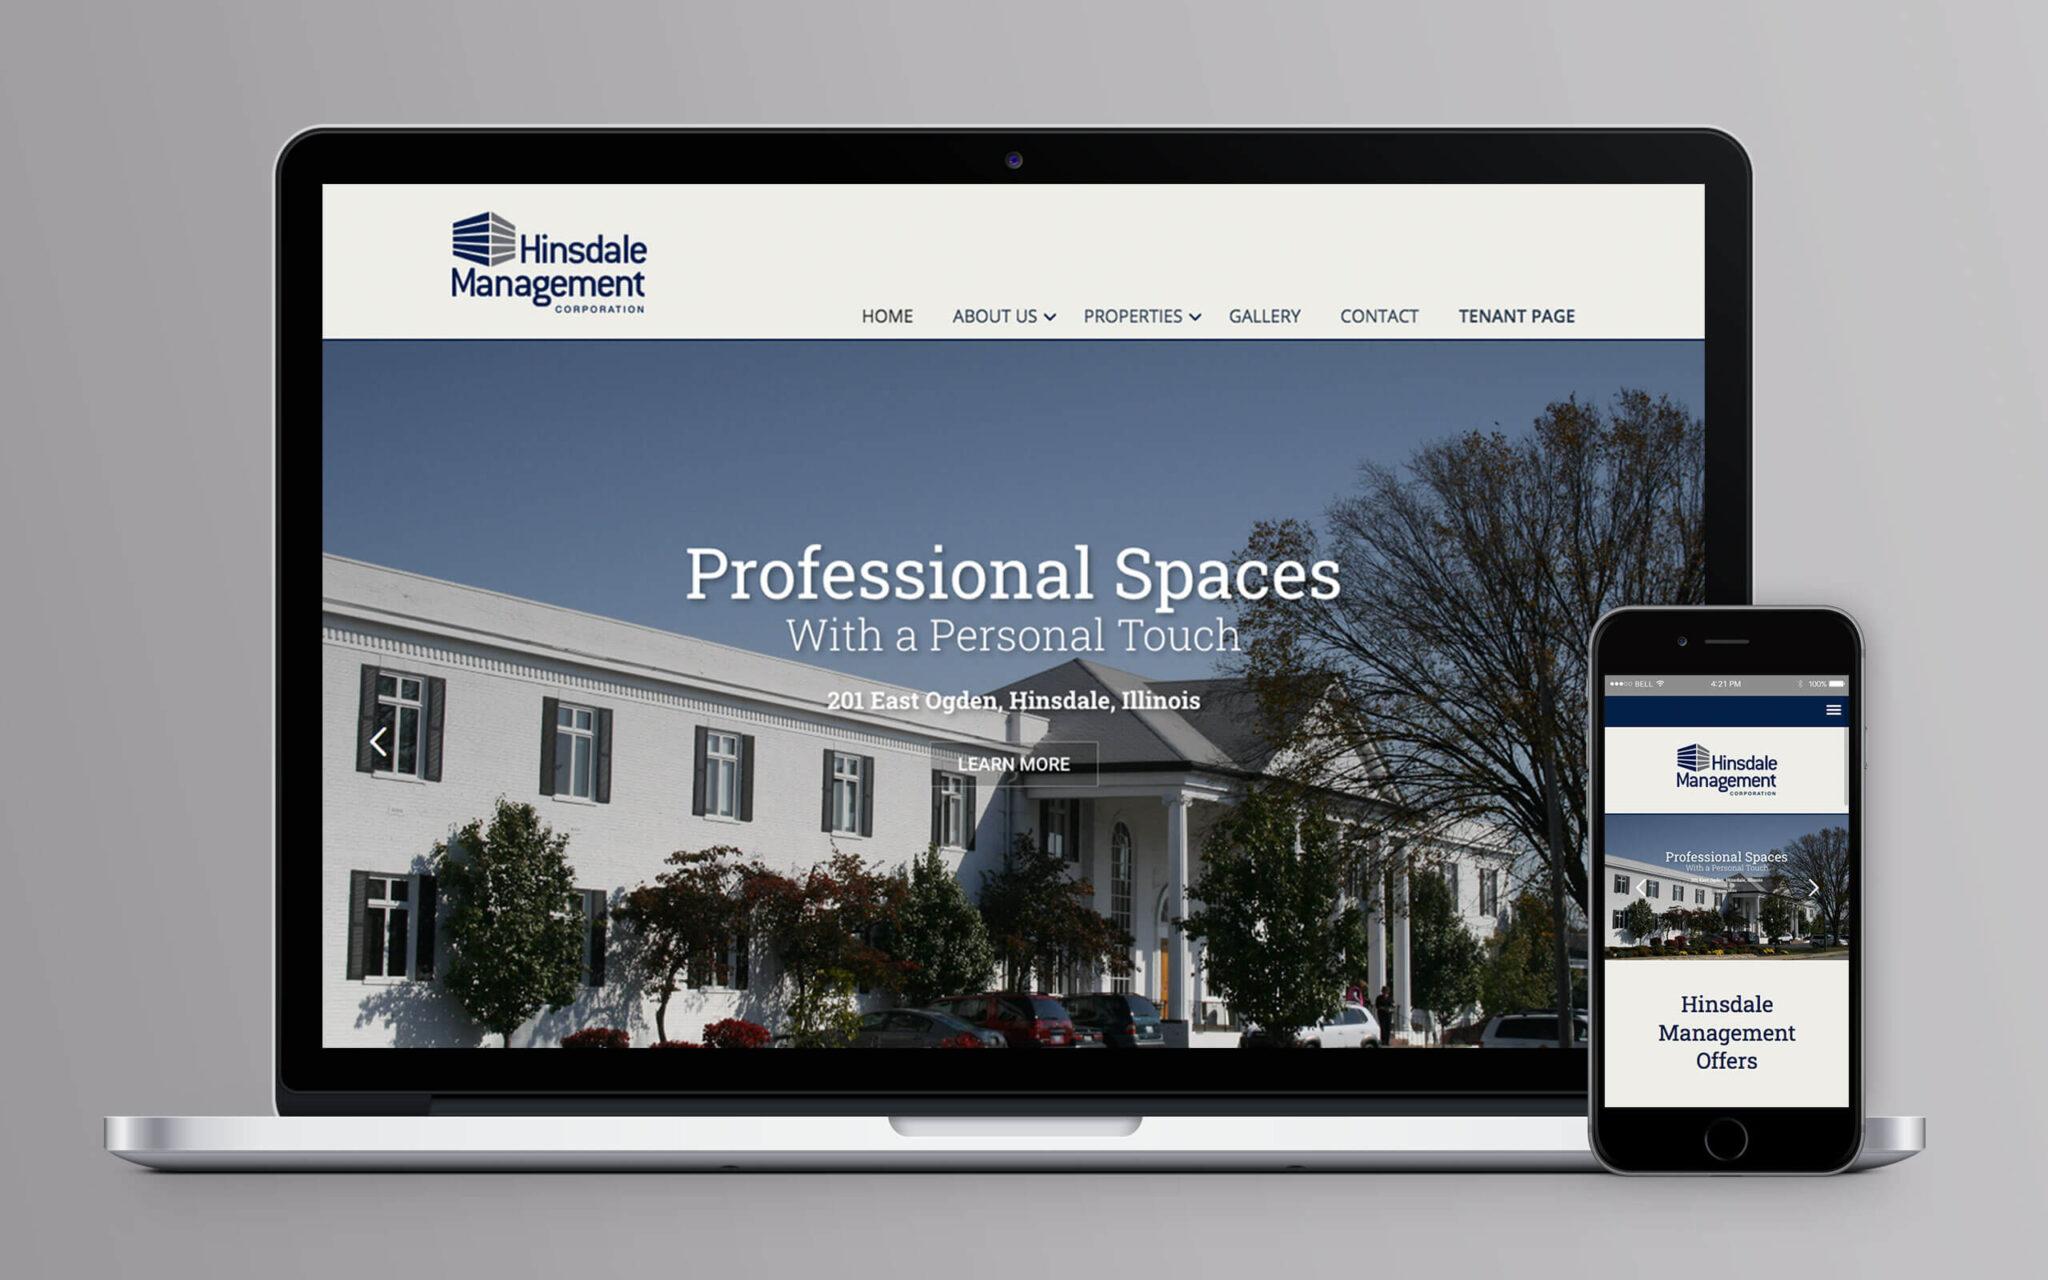 Hinsdale Management Corporation Website Home